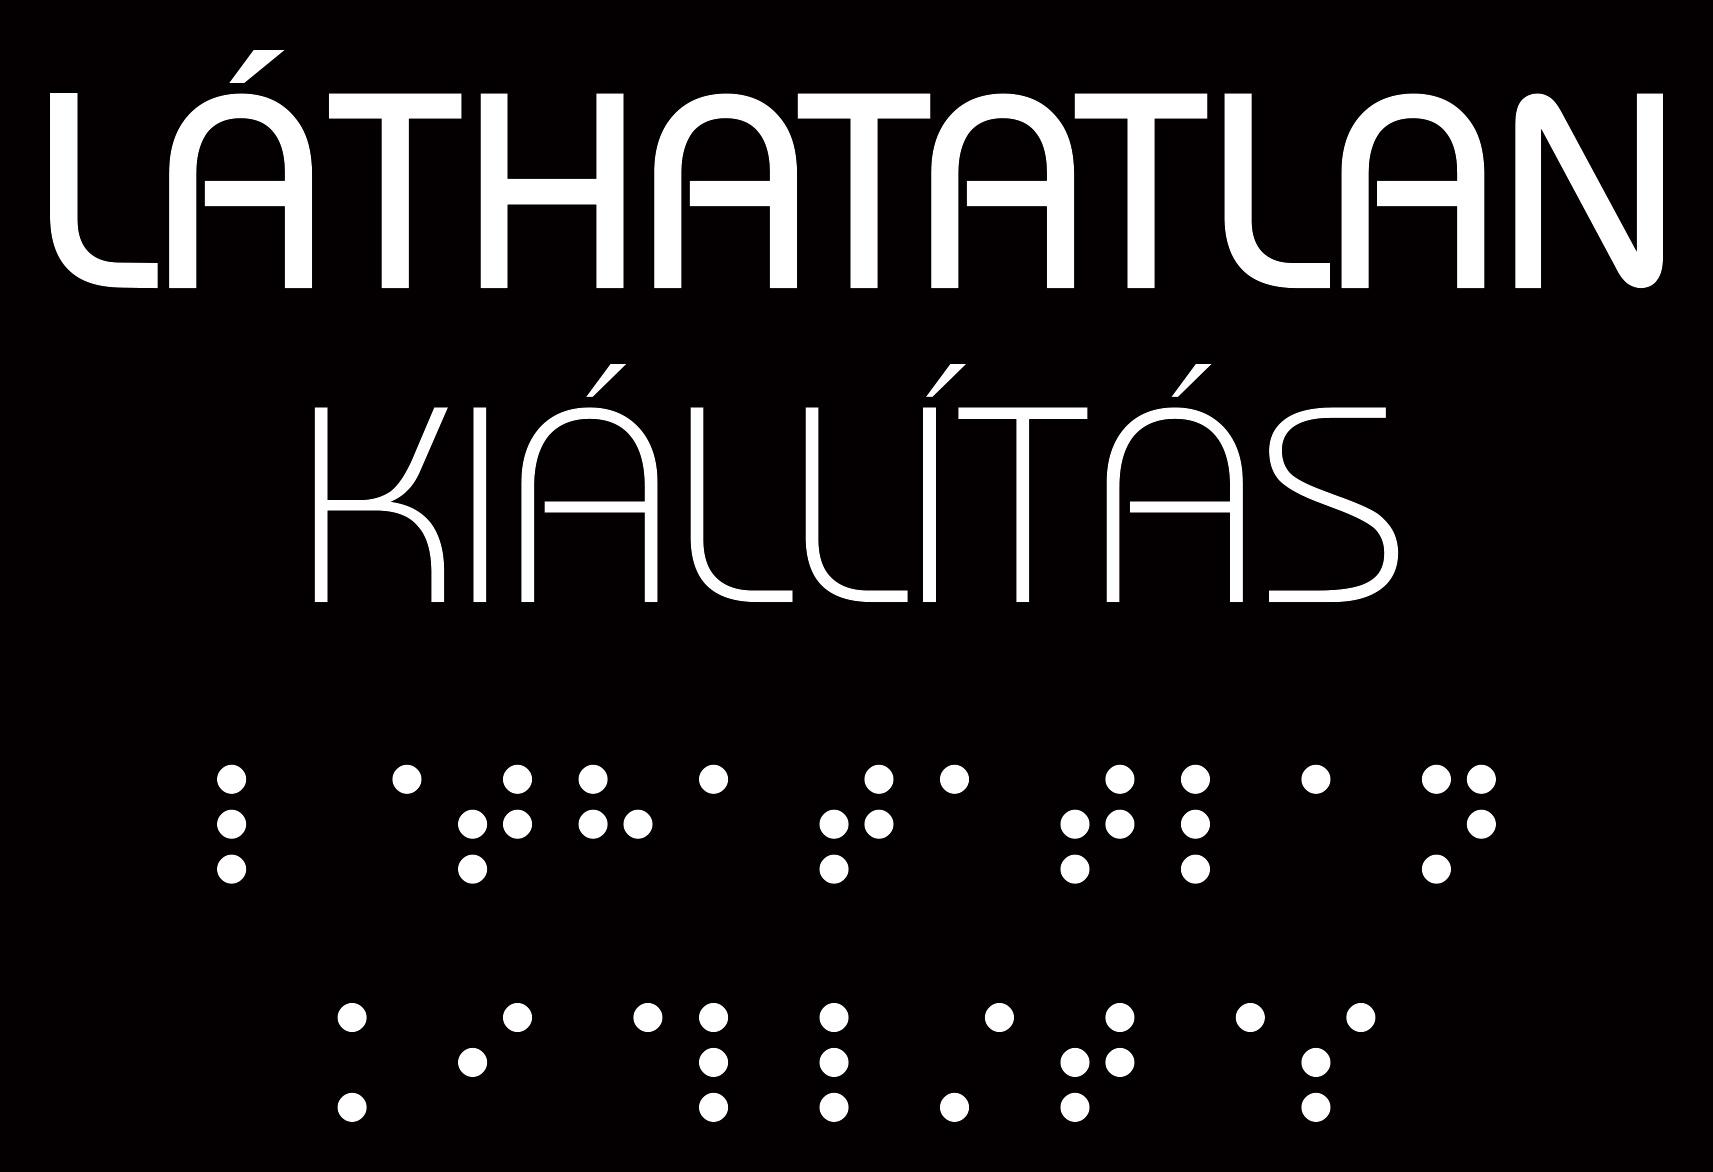 lathatatlan_kiallitas_logo.jpg